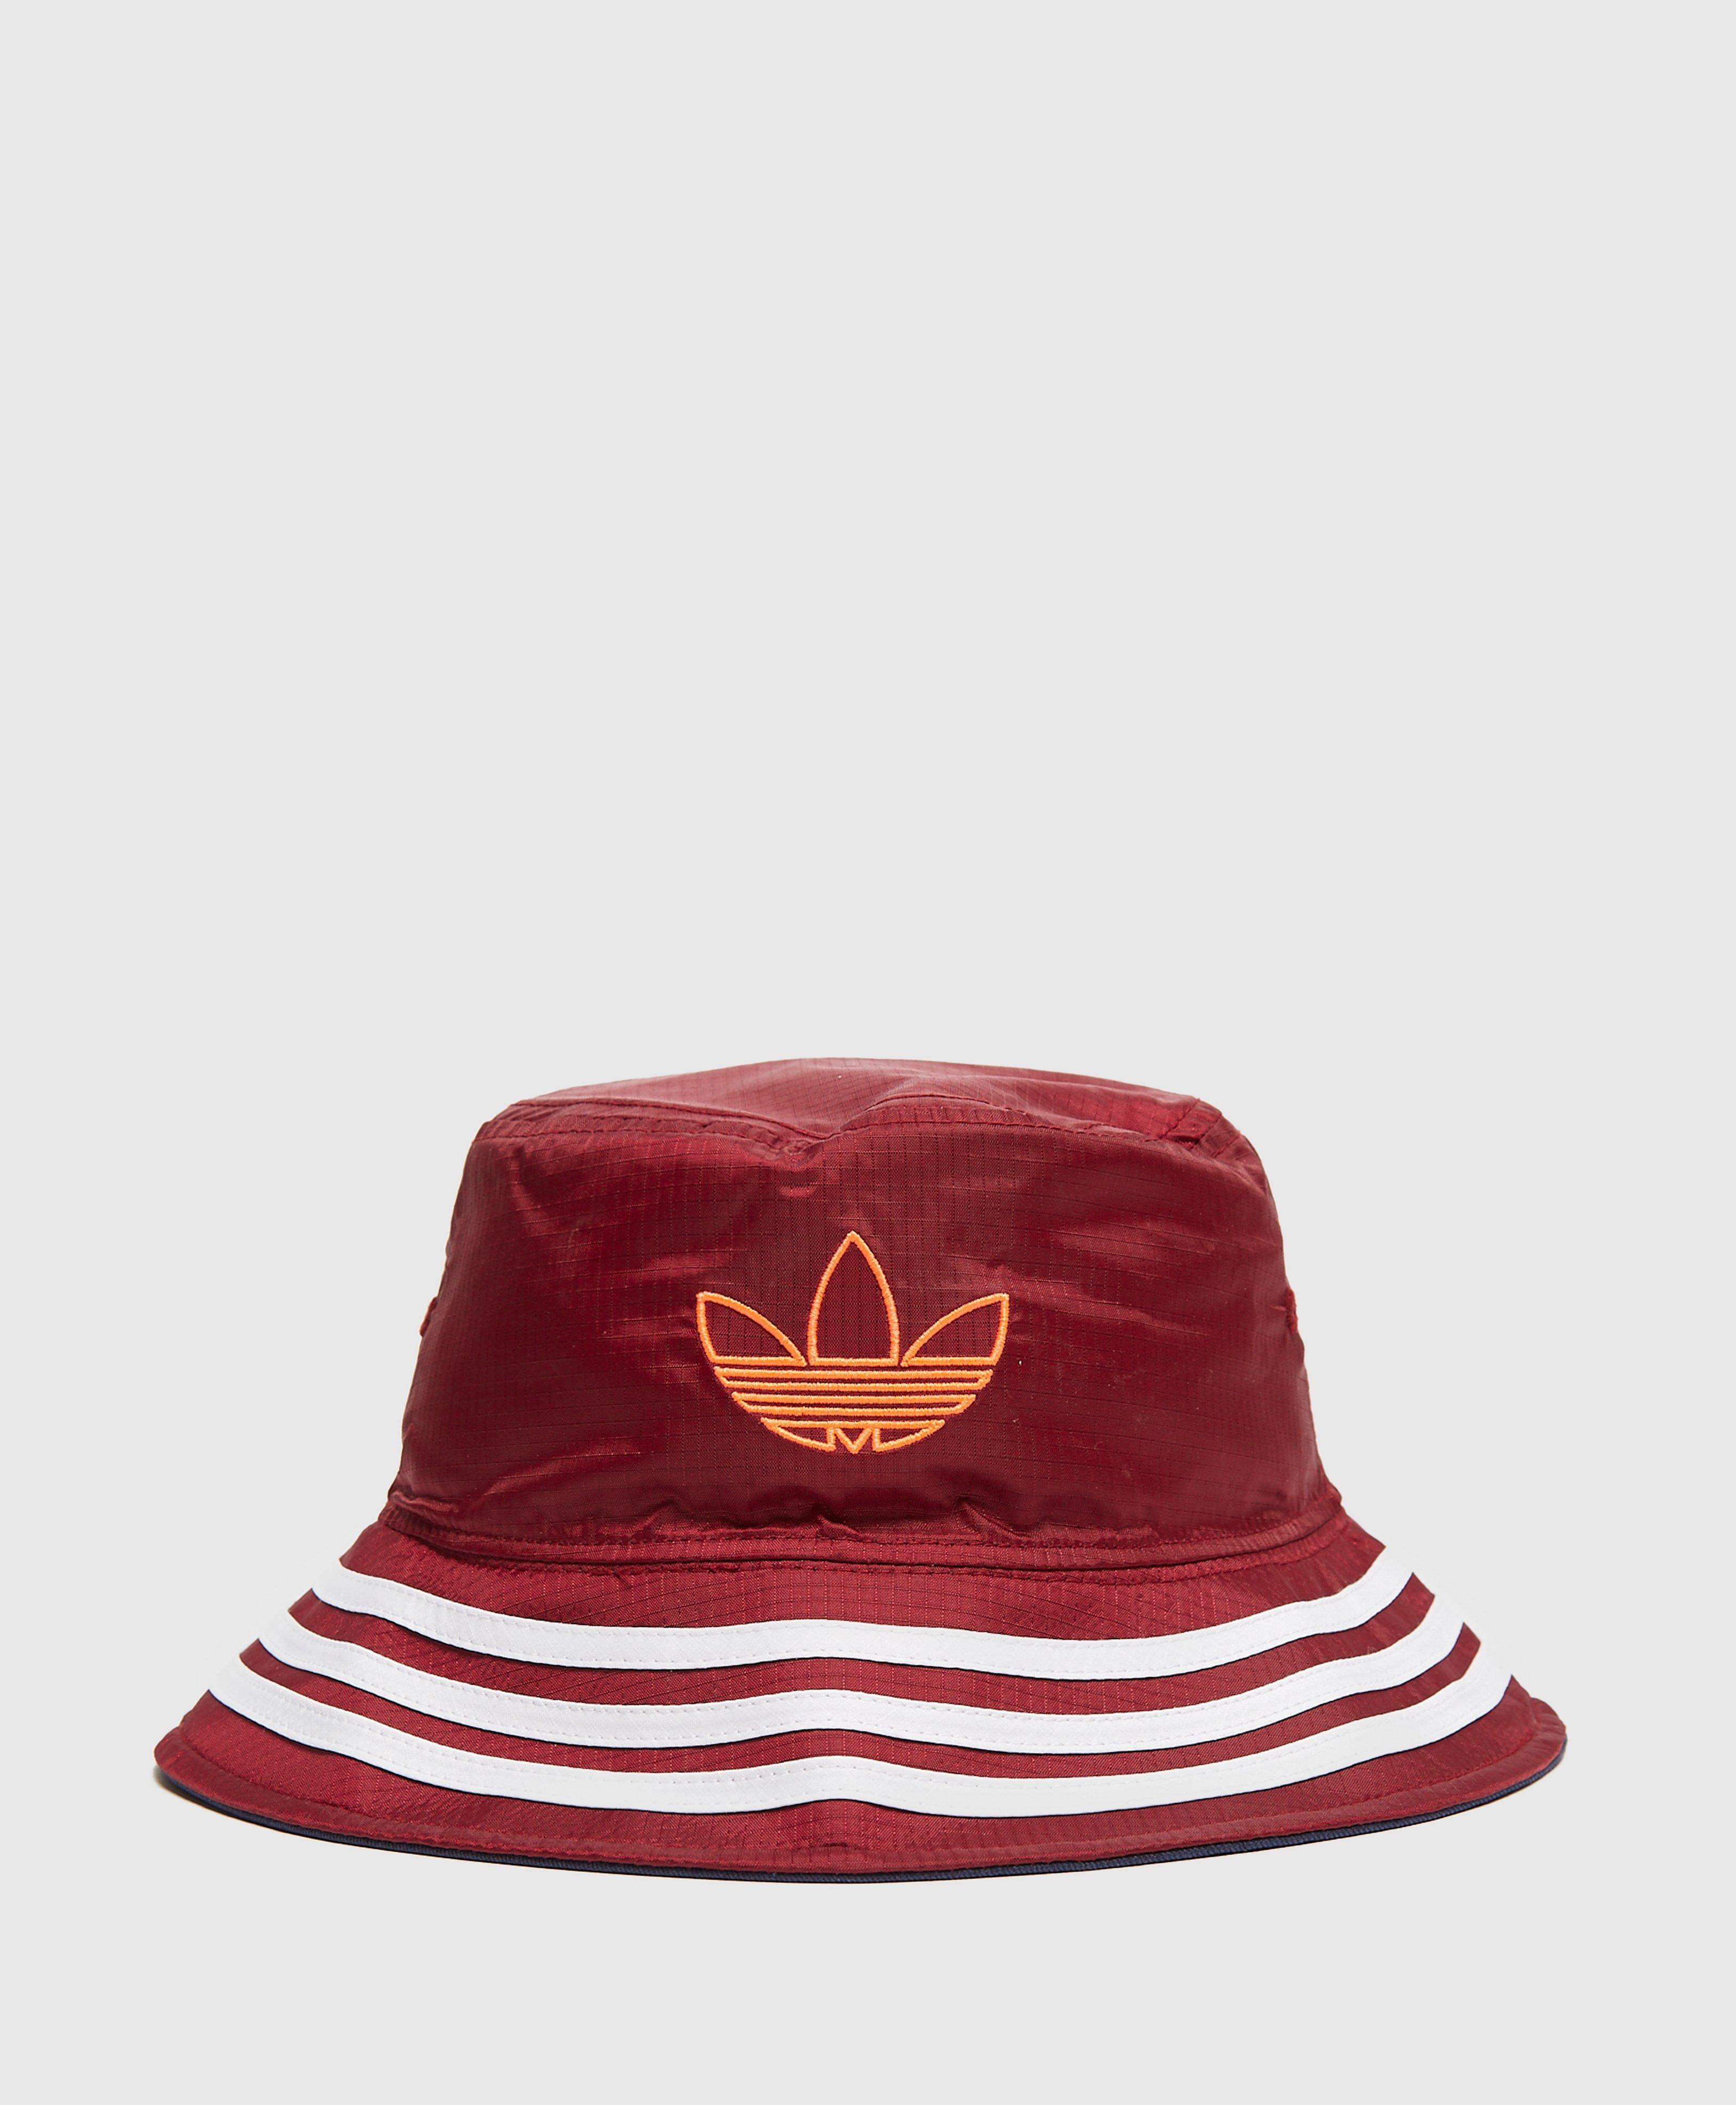 colgar Posada Fobia  adidas Originals Sport Reversible Bucket Hat | scotts Menswear